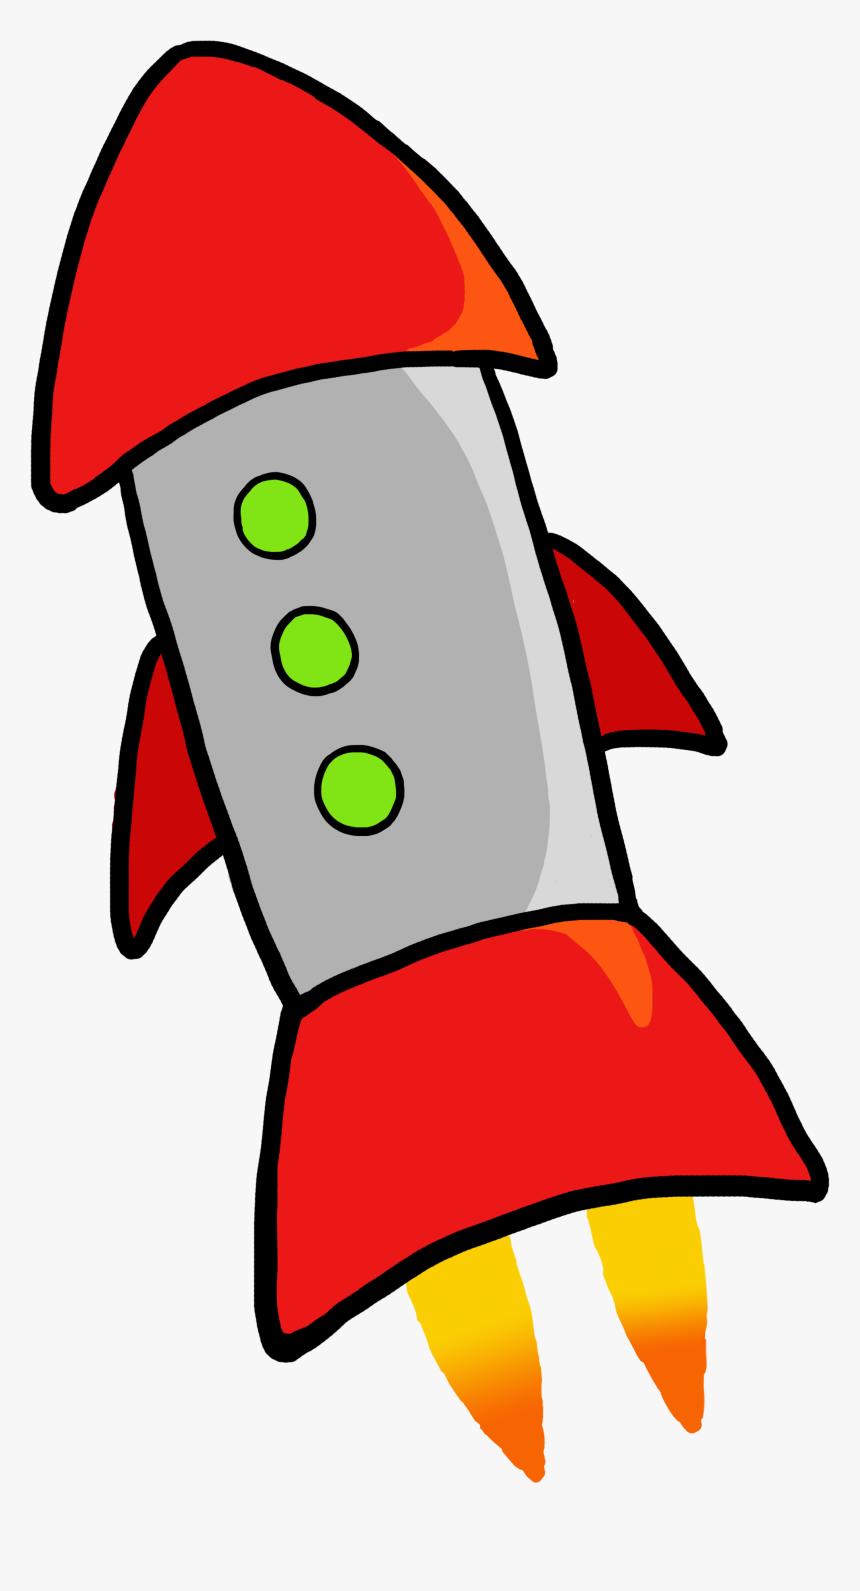 Rocket Images Free Download Clipart - Diwali Rocket, HD Png Download, Free Download